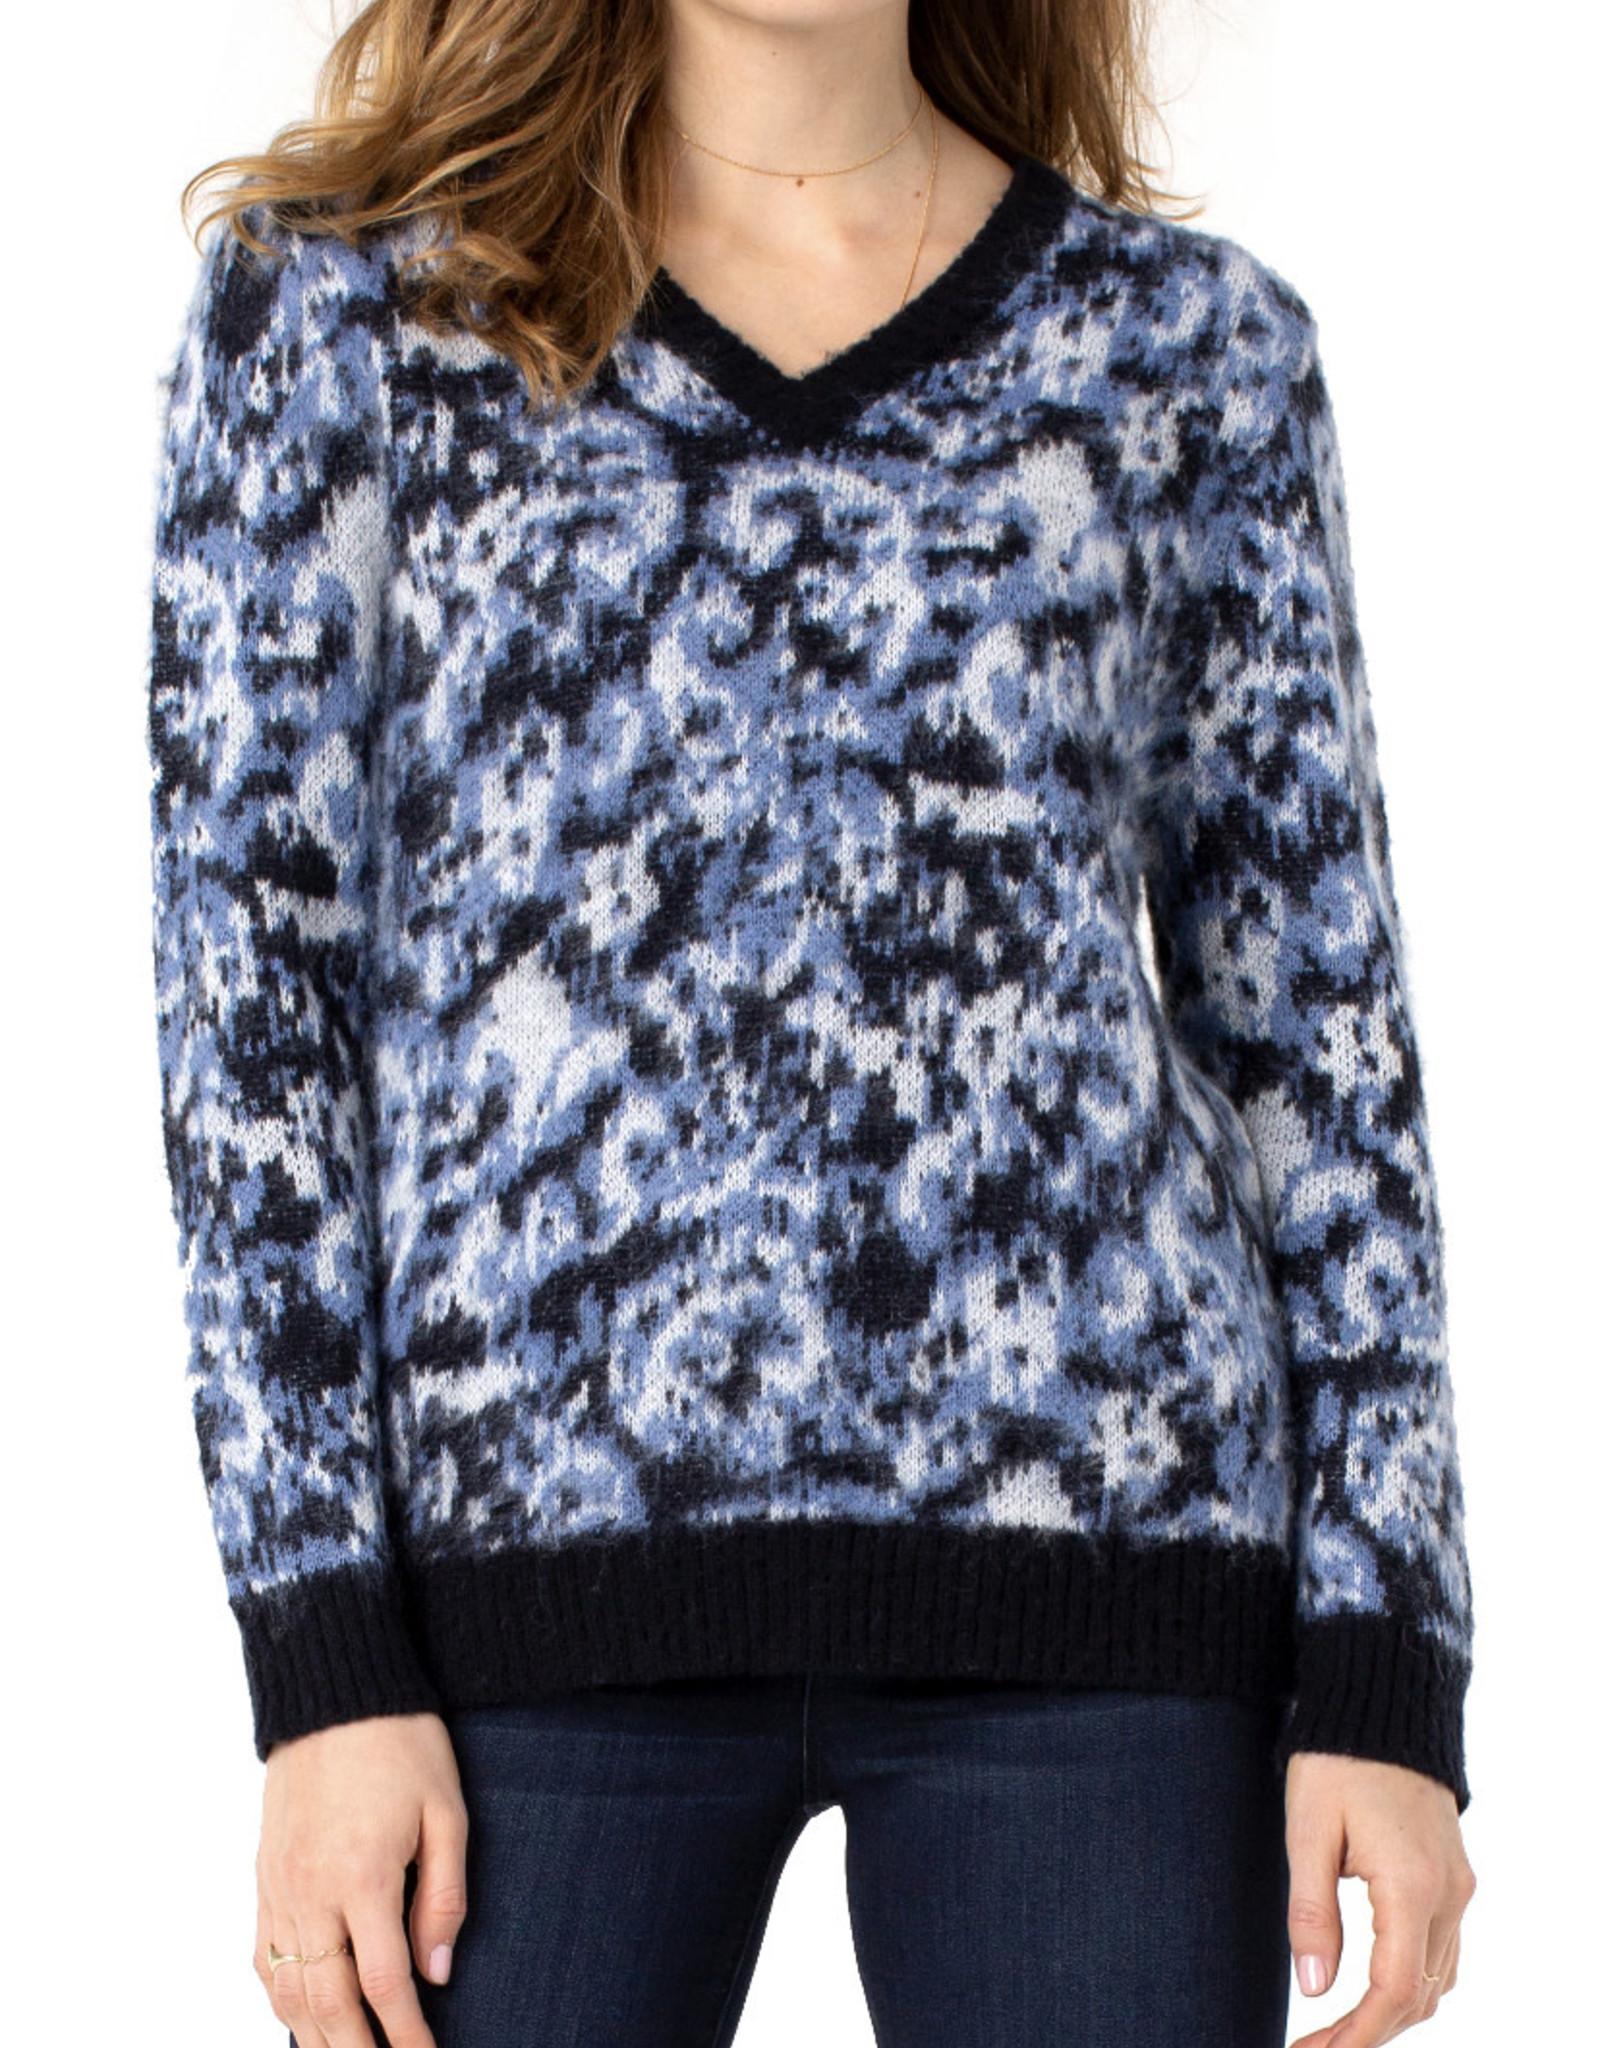 Liverpool V-neck sweater